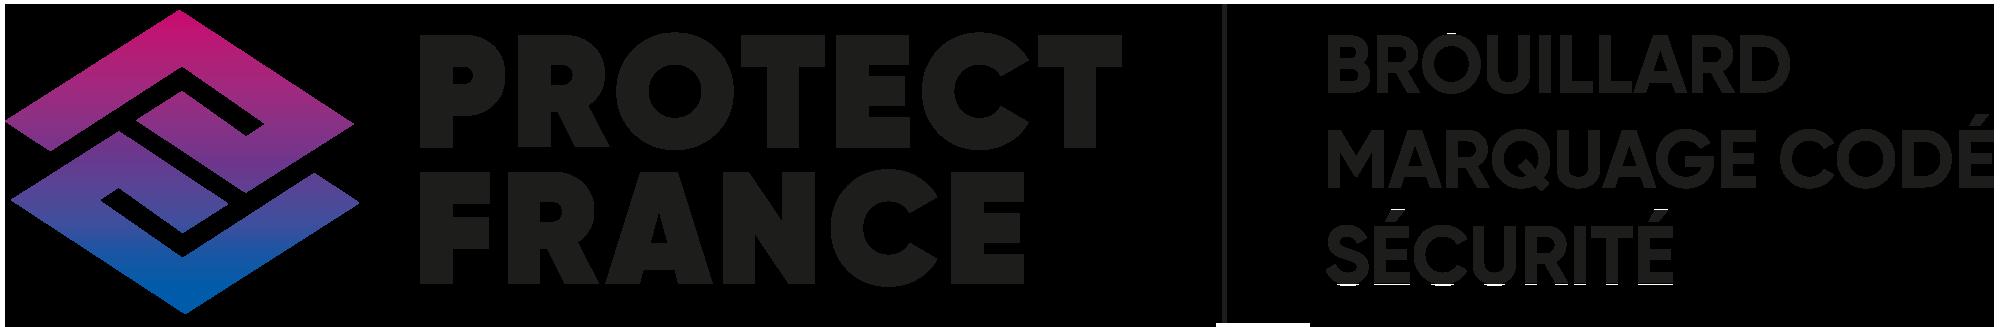 logo-coul-transp